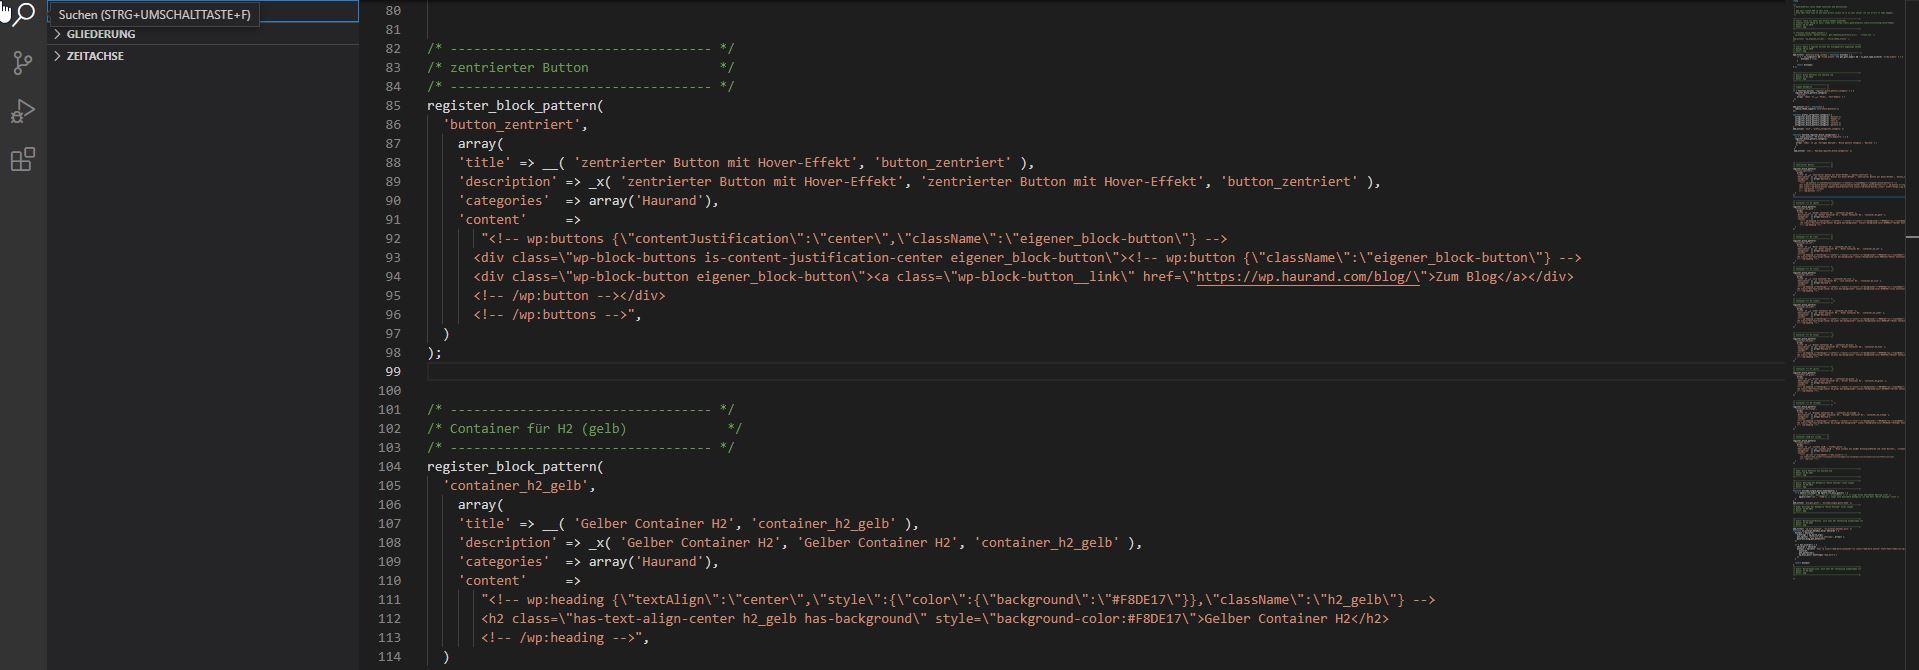 Code-Snippets im WordPress-Dashboard